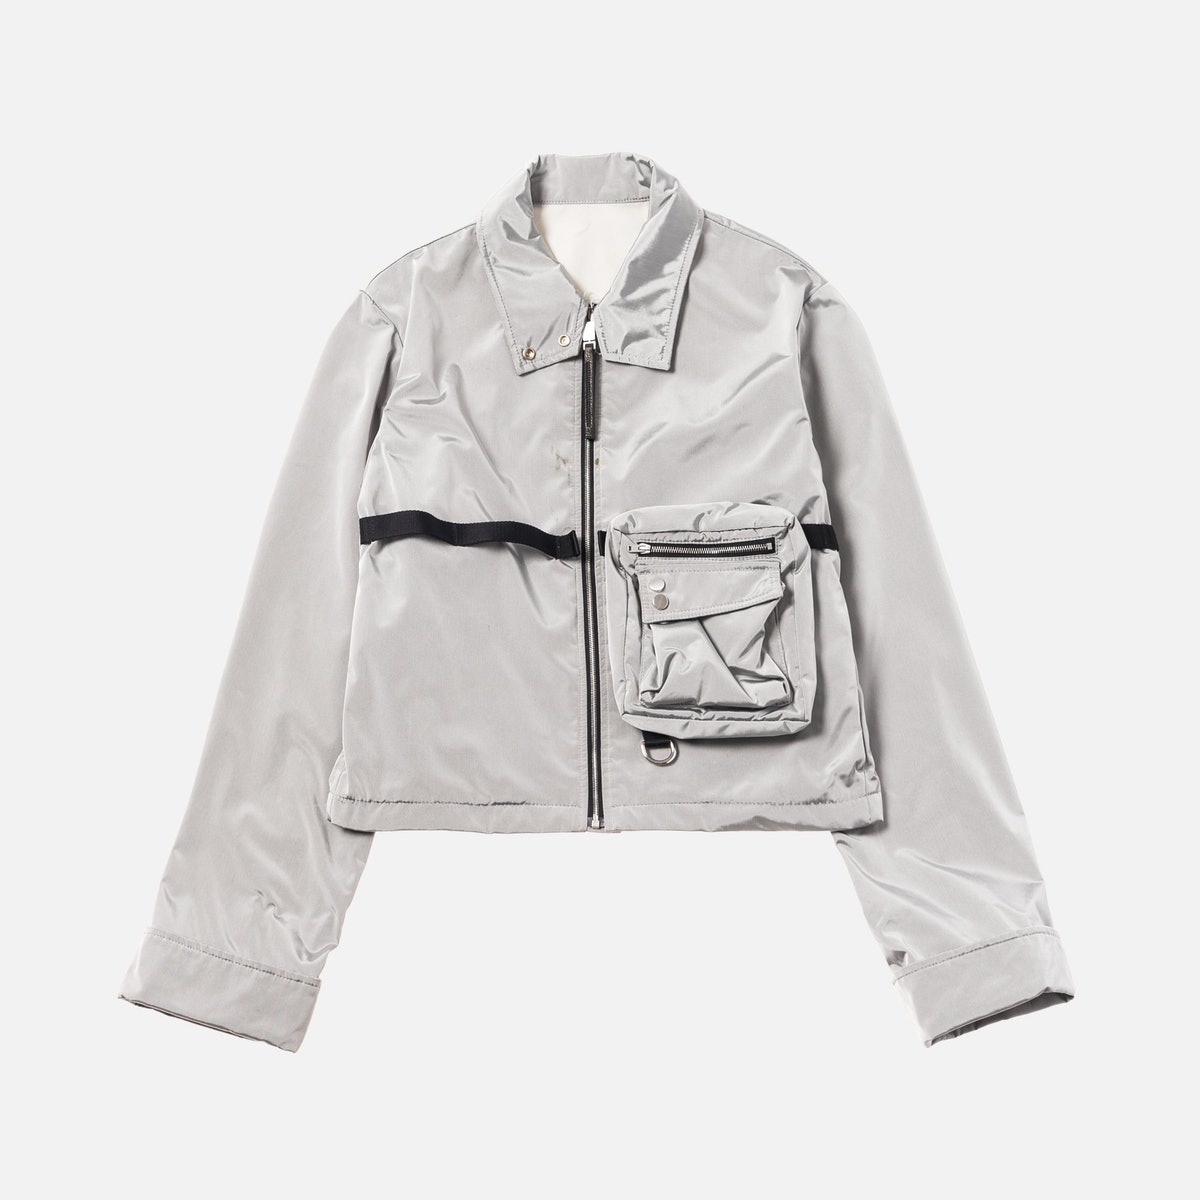 Silver Moon Jacket